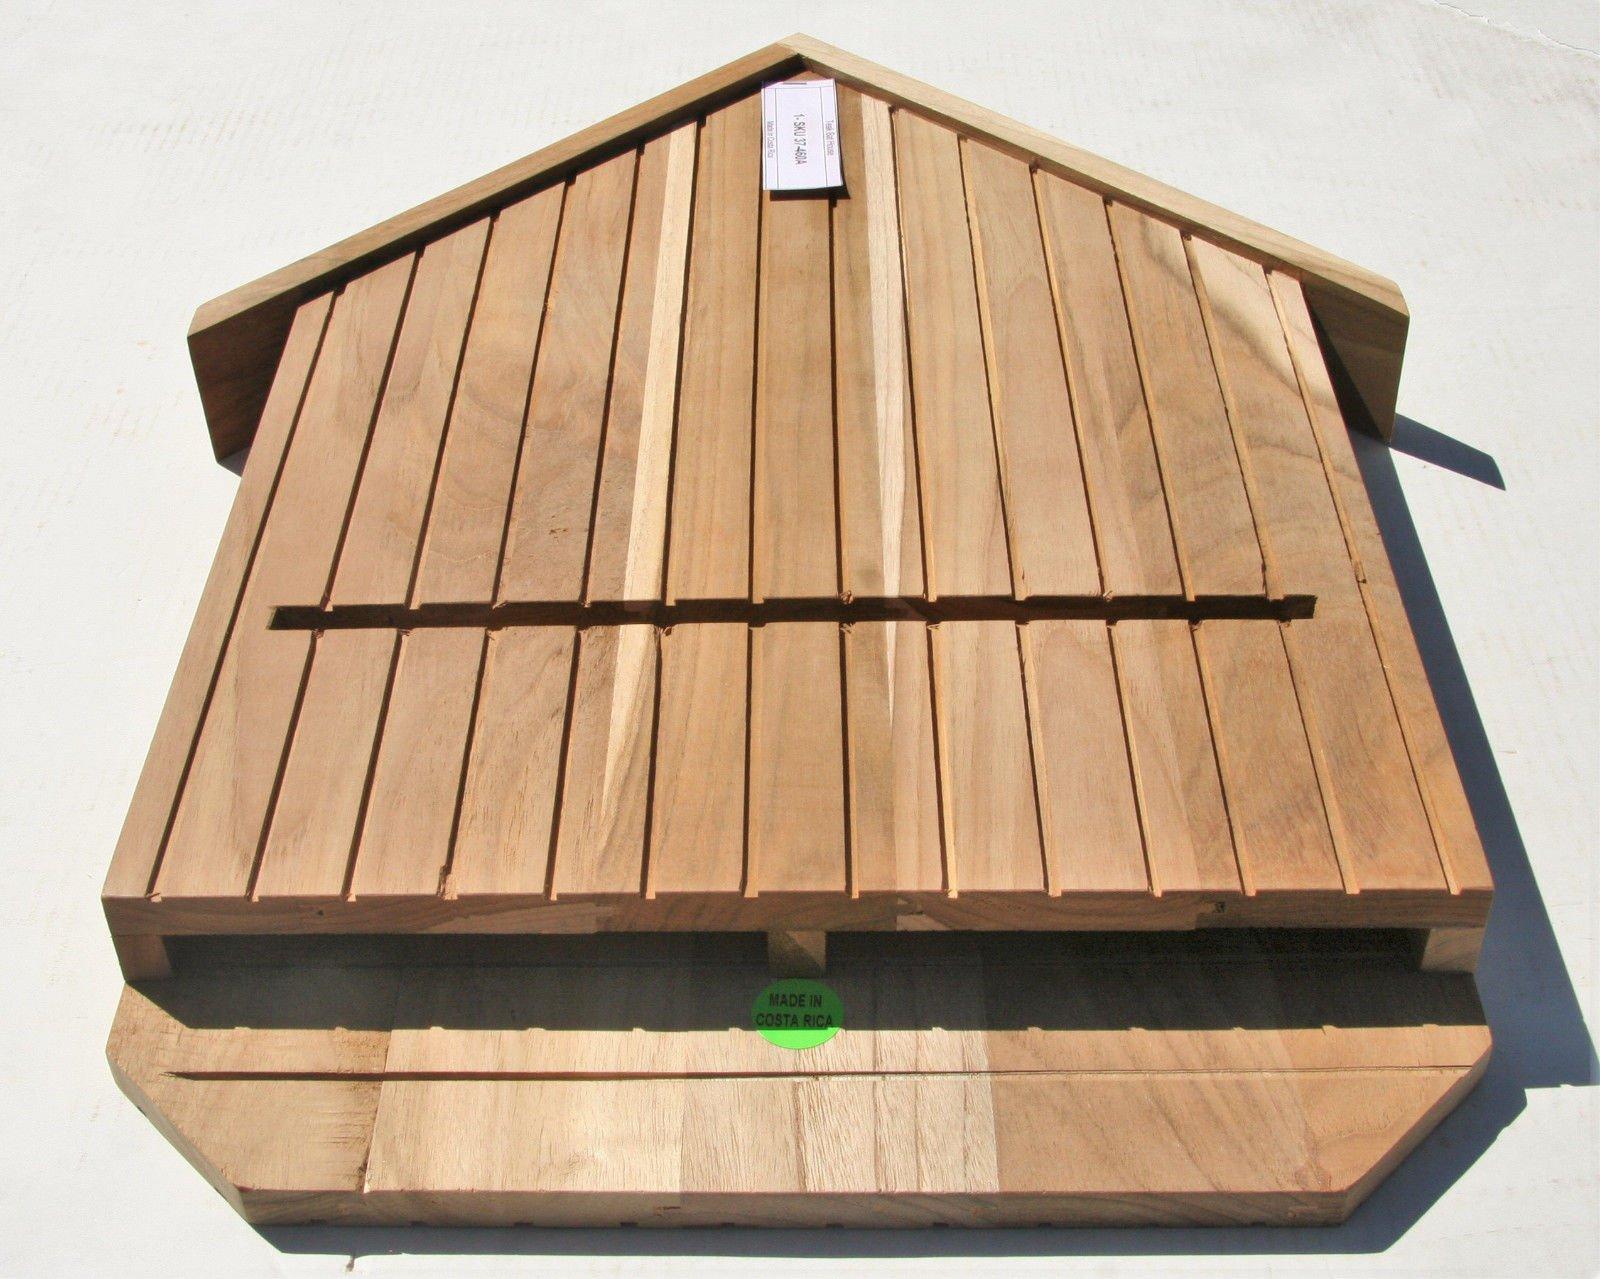 Diamond Tropical Hardwoods Solid Teak wood Bat House, great design, environmentally friendy=sustainable